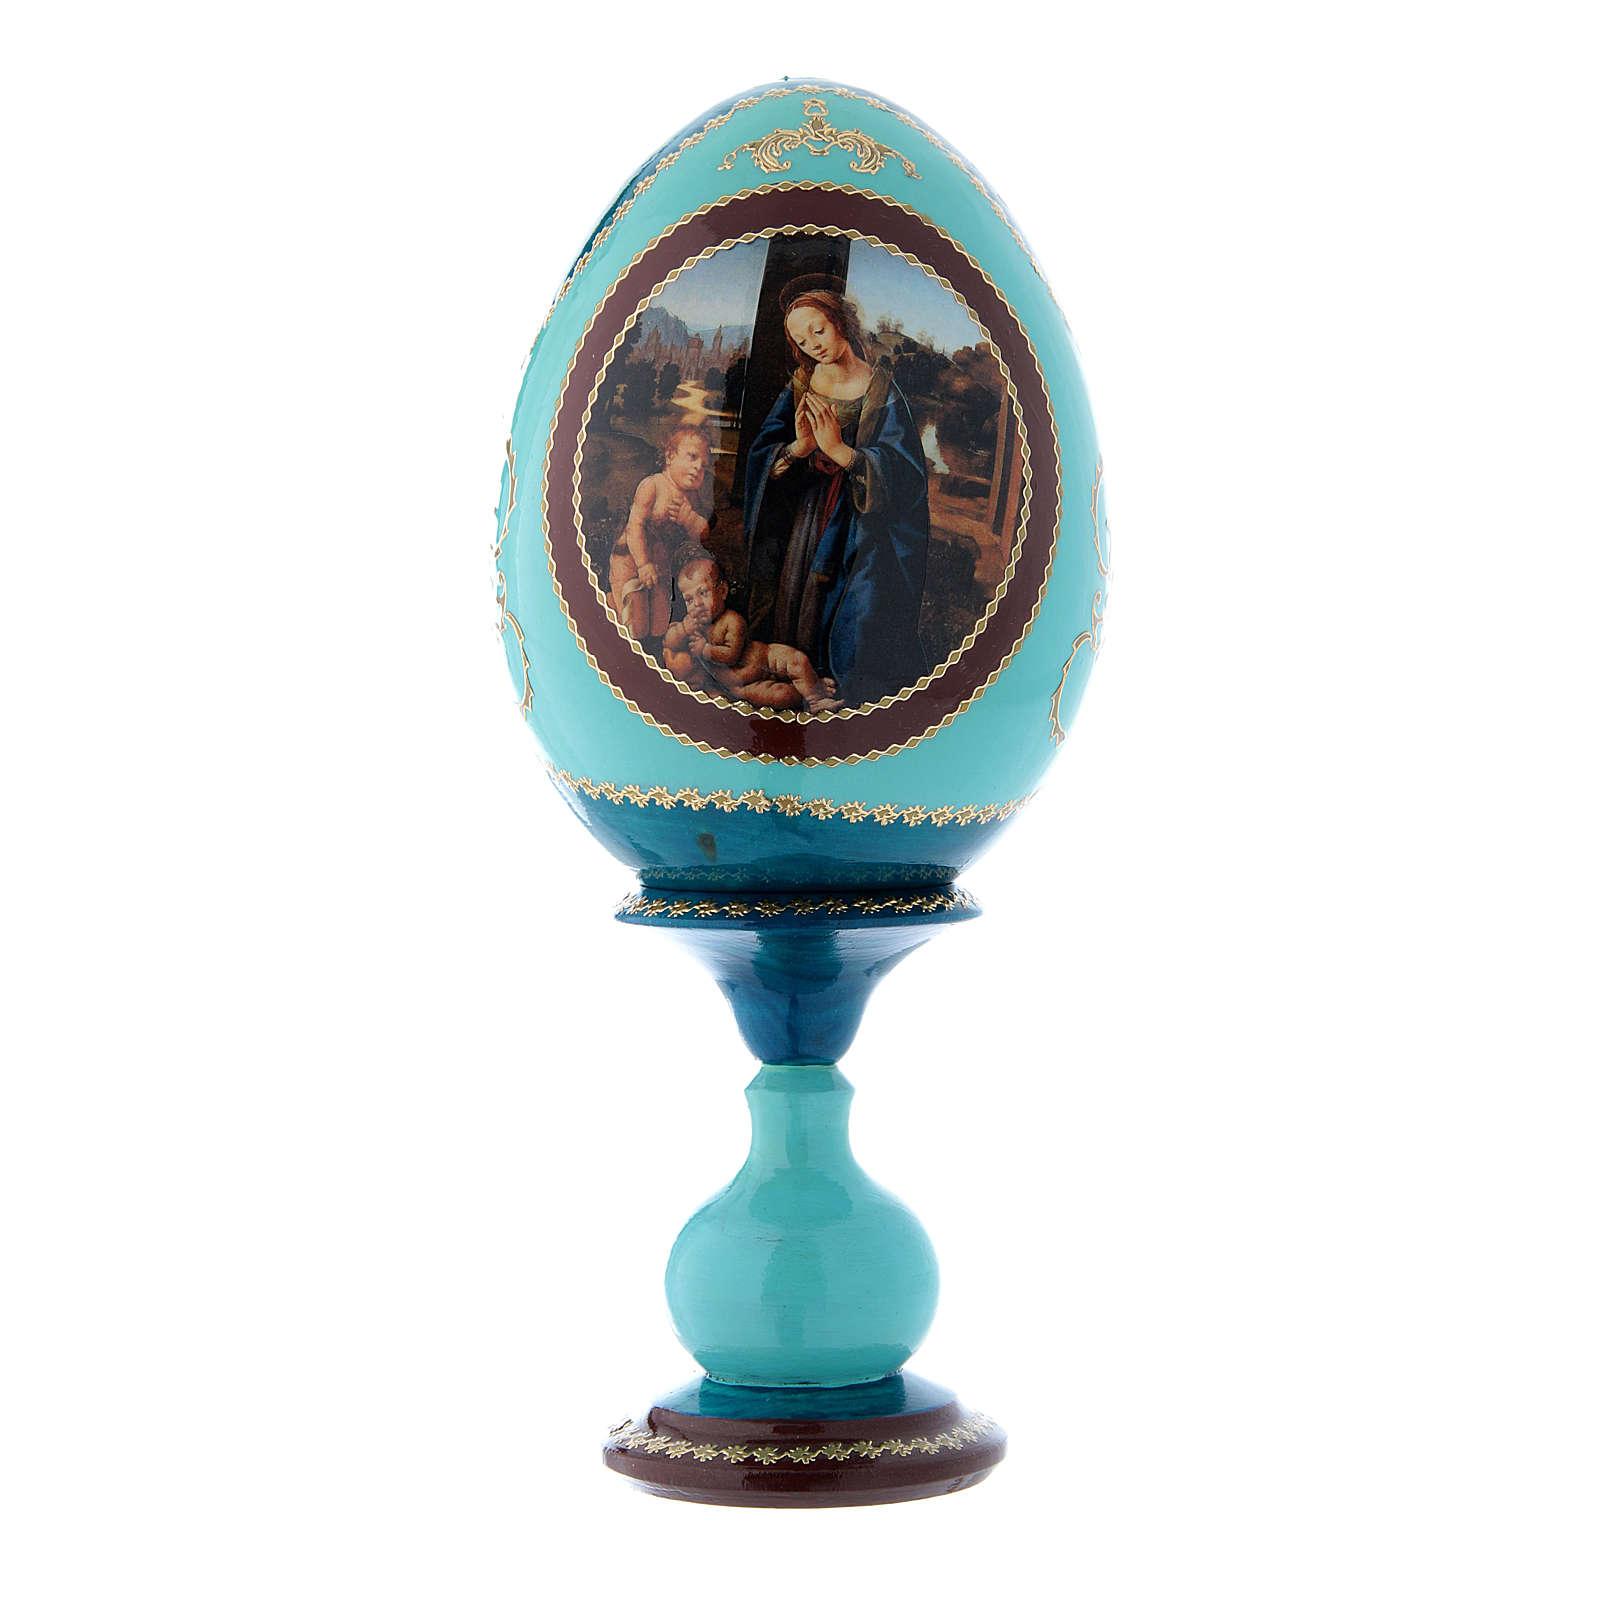 Russian Egg Madonna adoring the Child, Fabergé style, blue 20 cm 4